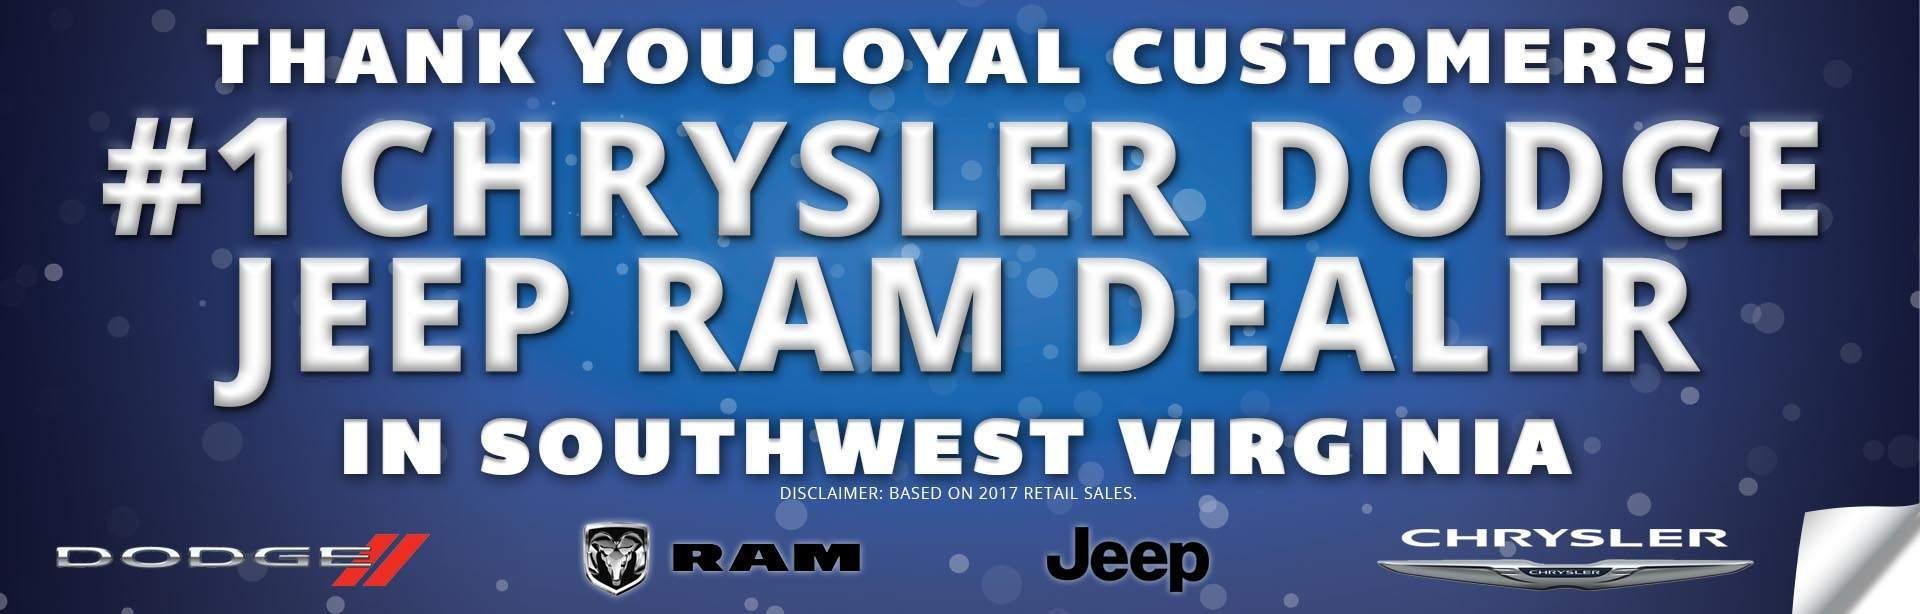 Used Car Dealerships In Roanoke Va >> Shelor Motor Mile Dealerships Christiansburg VA | Used ...